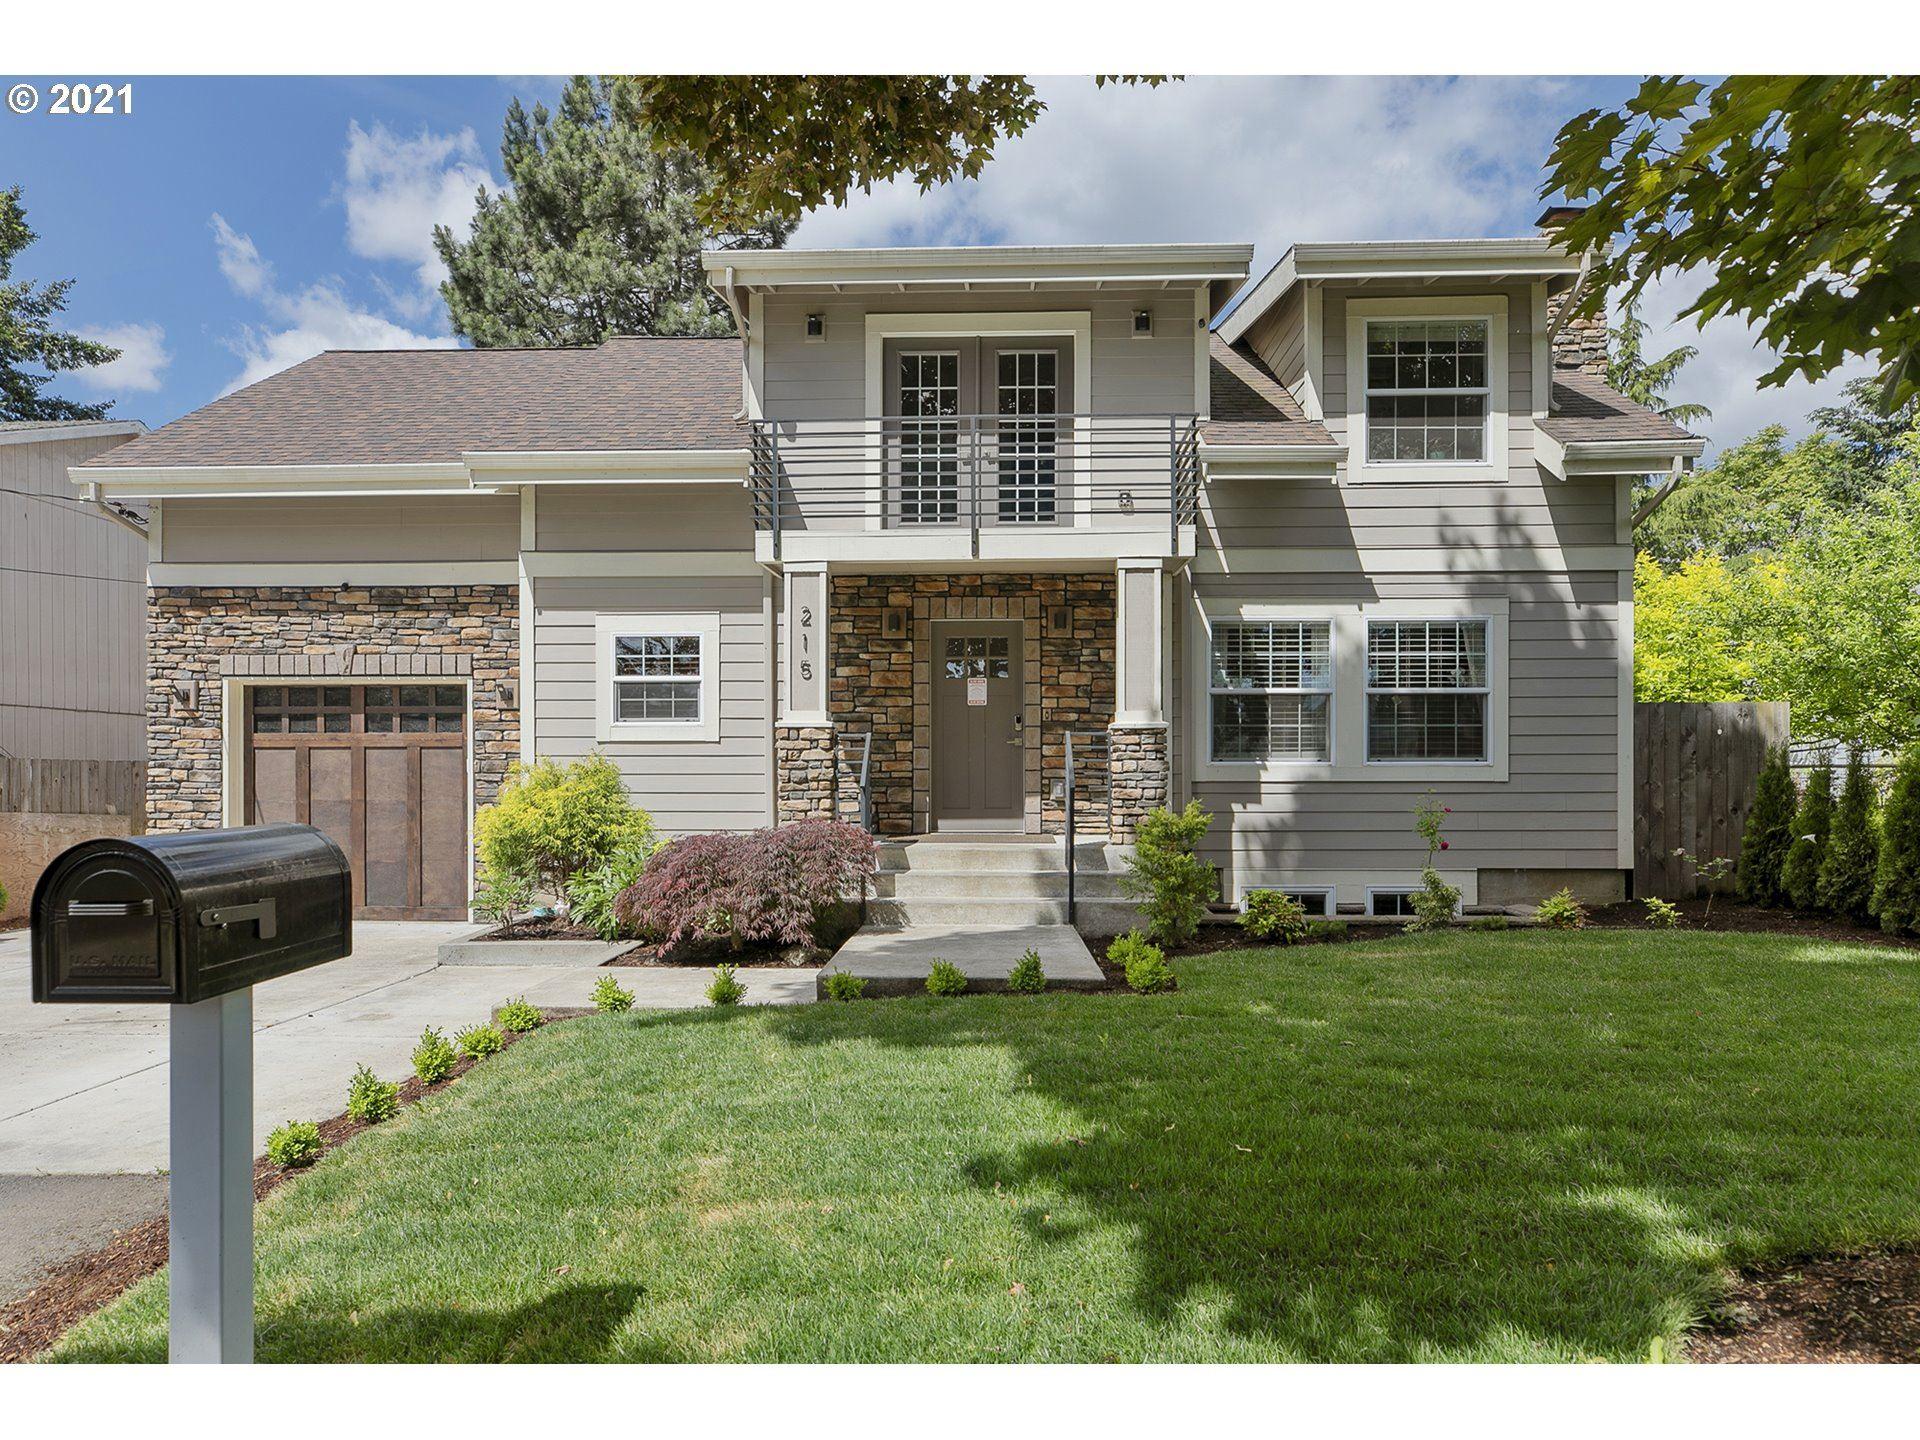 215 NE 108TH AVE, Portland, OR 97220 - MLS#: 21223761